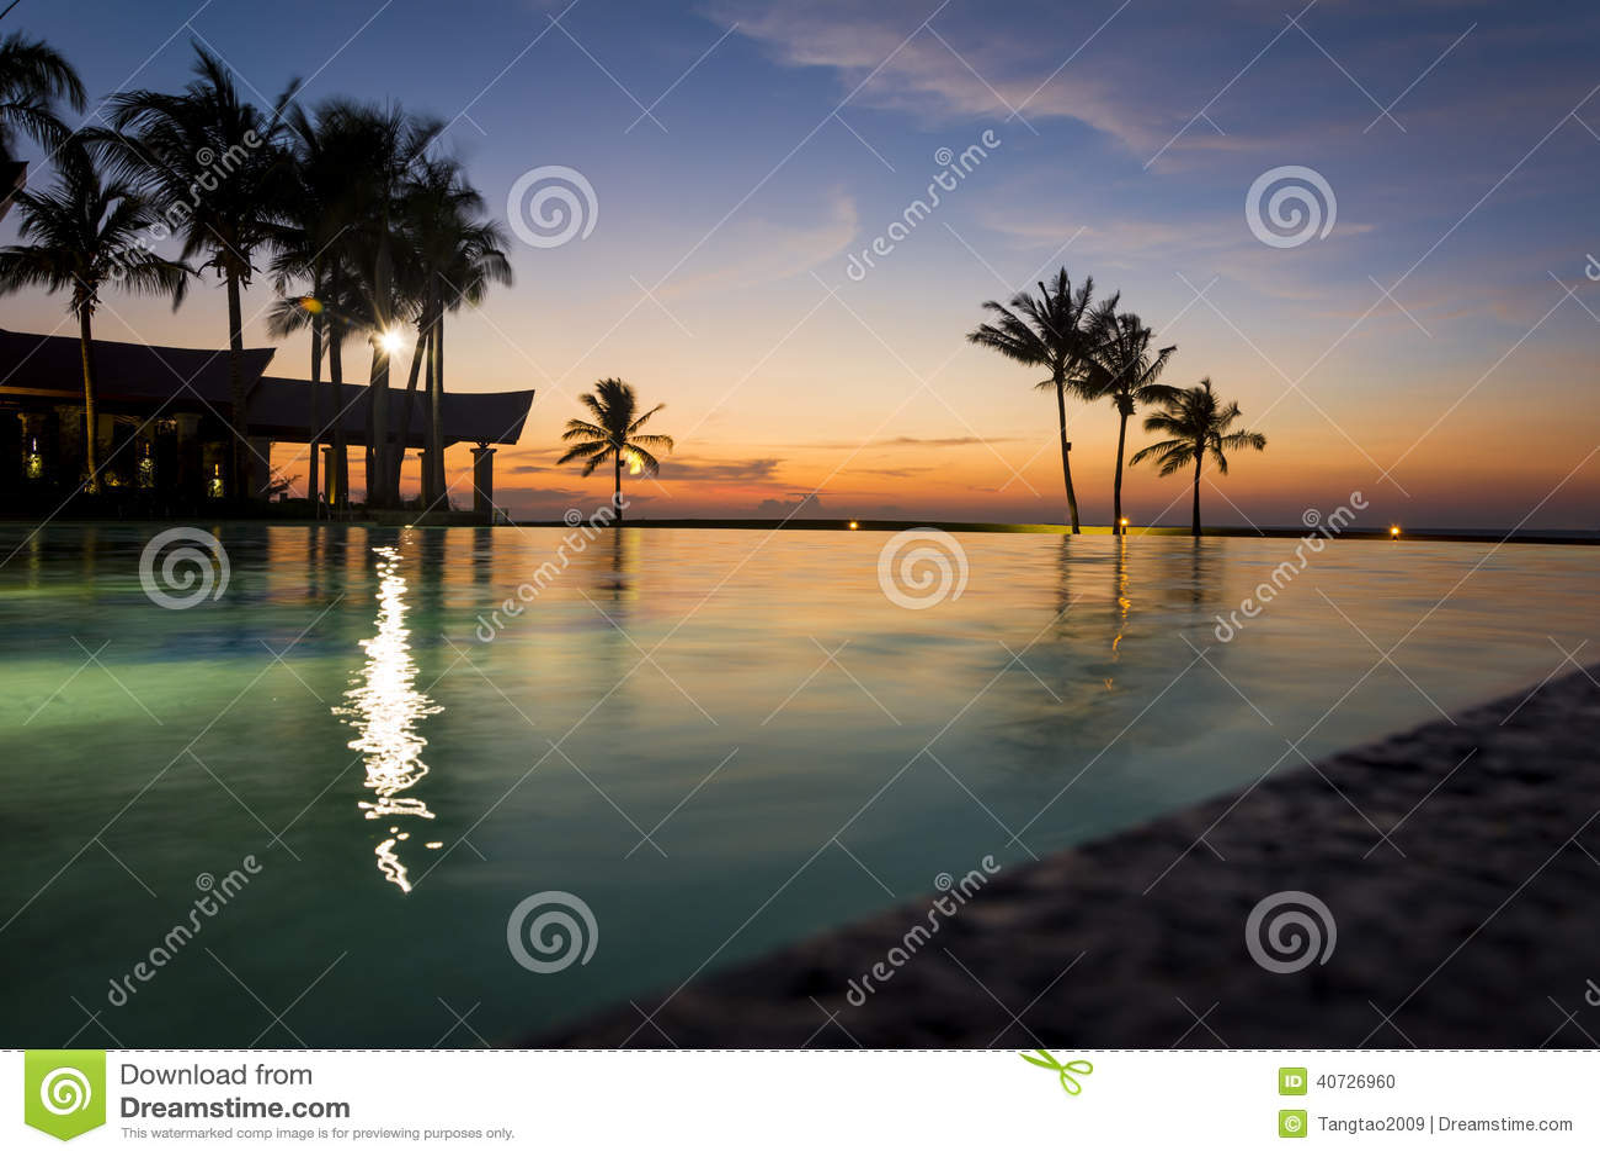 Solnedgång på det imperialistiska hotellet, Brunei